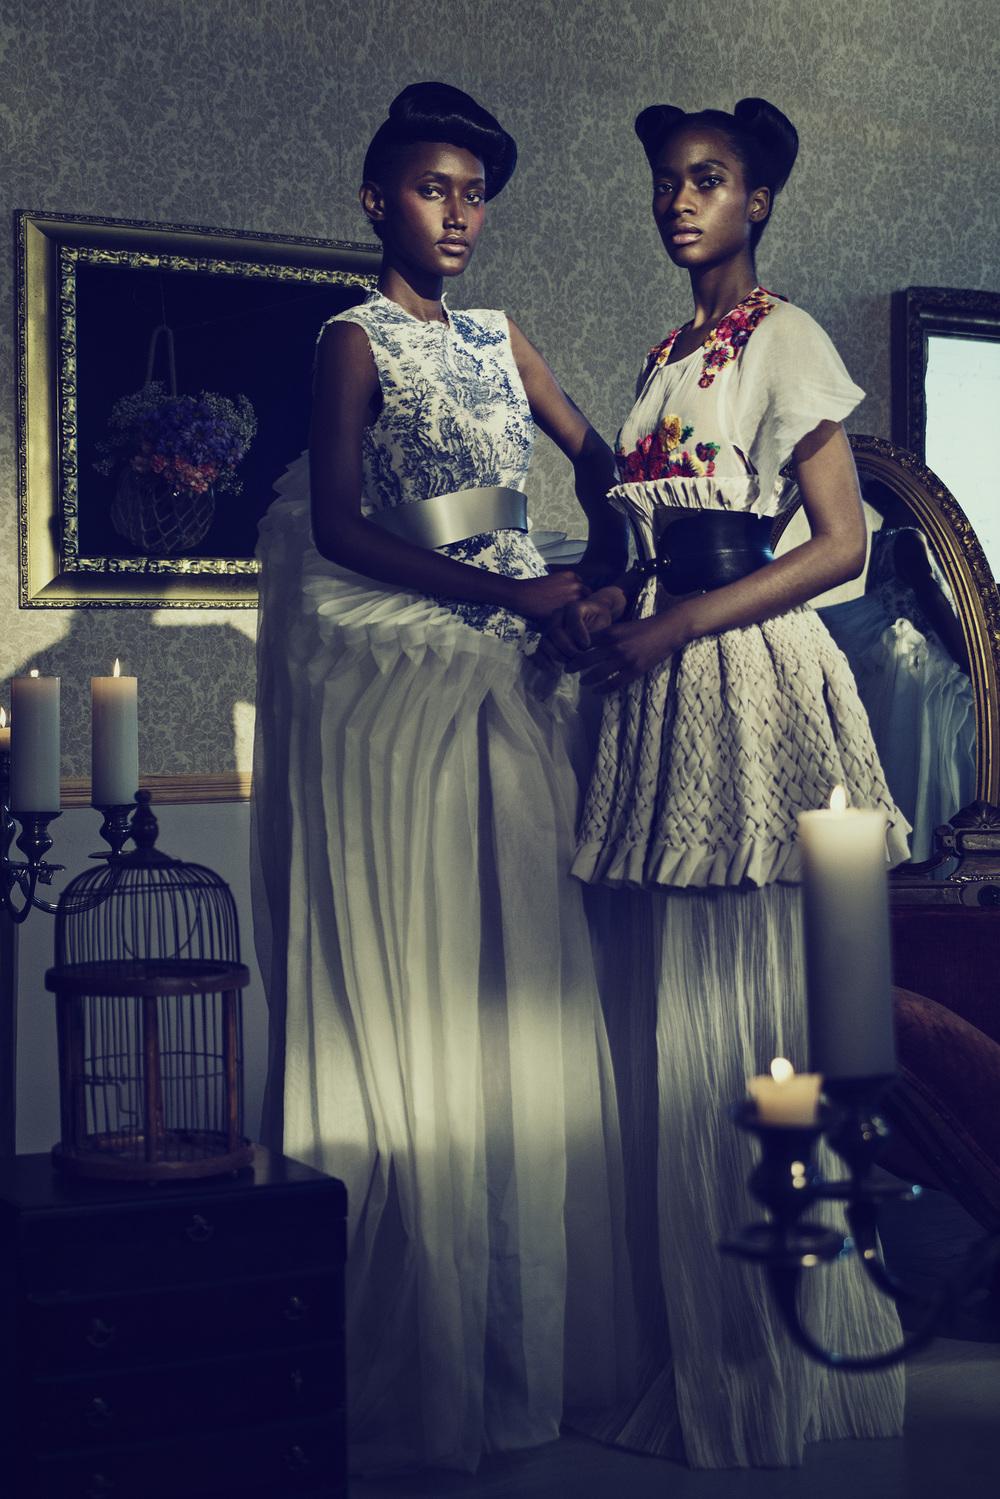 New York Fashion Photographers Photography Team Jens Stoltze Stefanie Djie